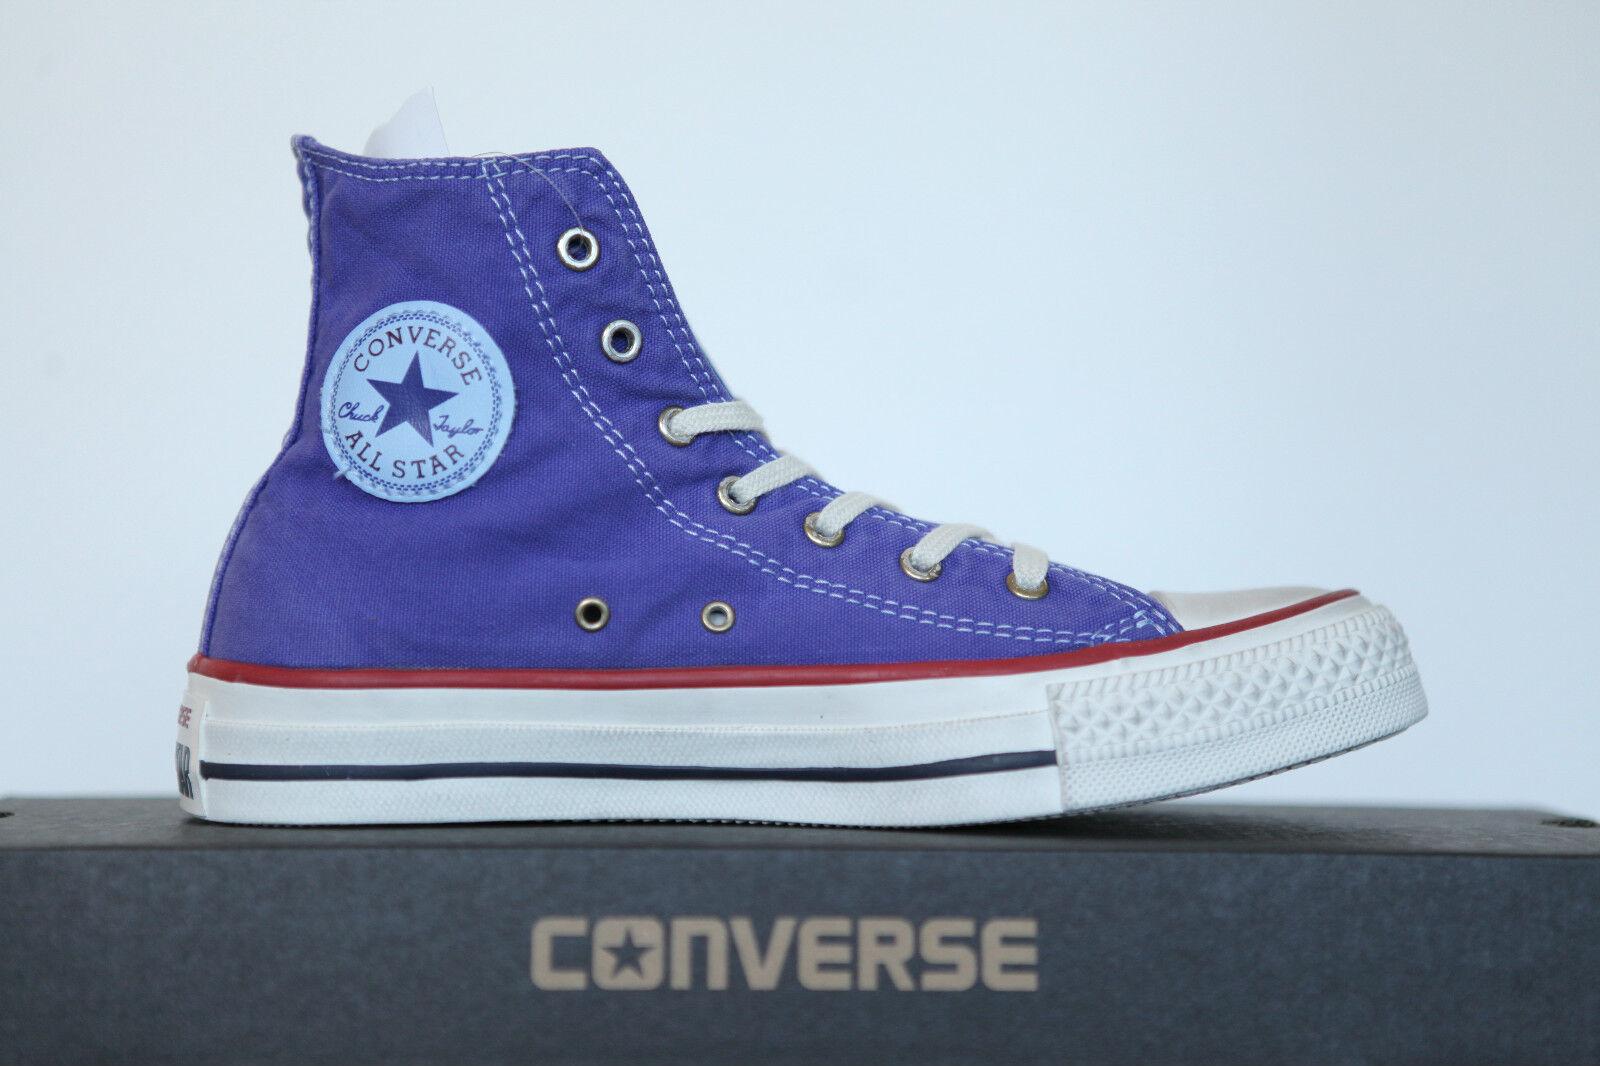 Neu All Star Converse Chucks Hi Washed Schuhe Gr.39 142629c Sneaker Gr.39 Schuhe UK 6 de9b3f